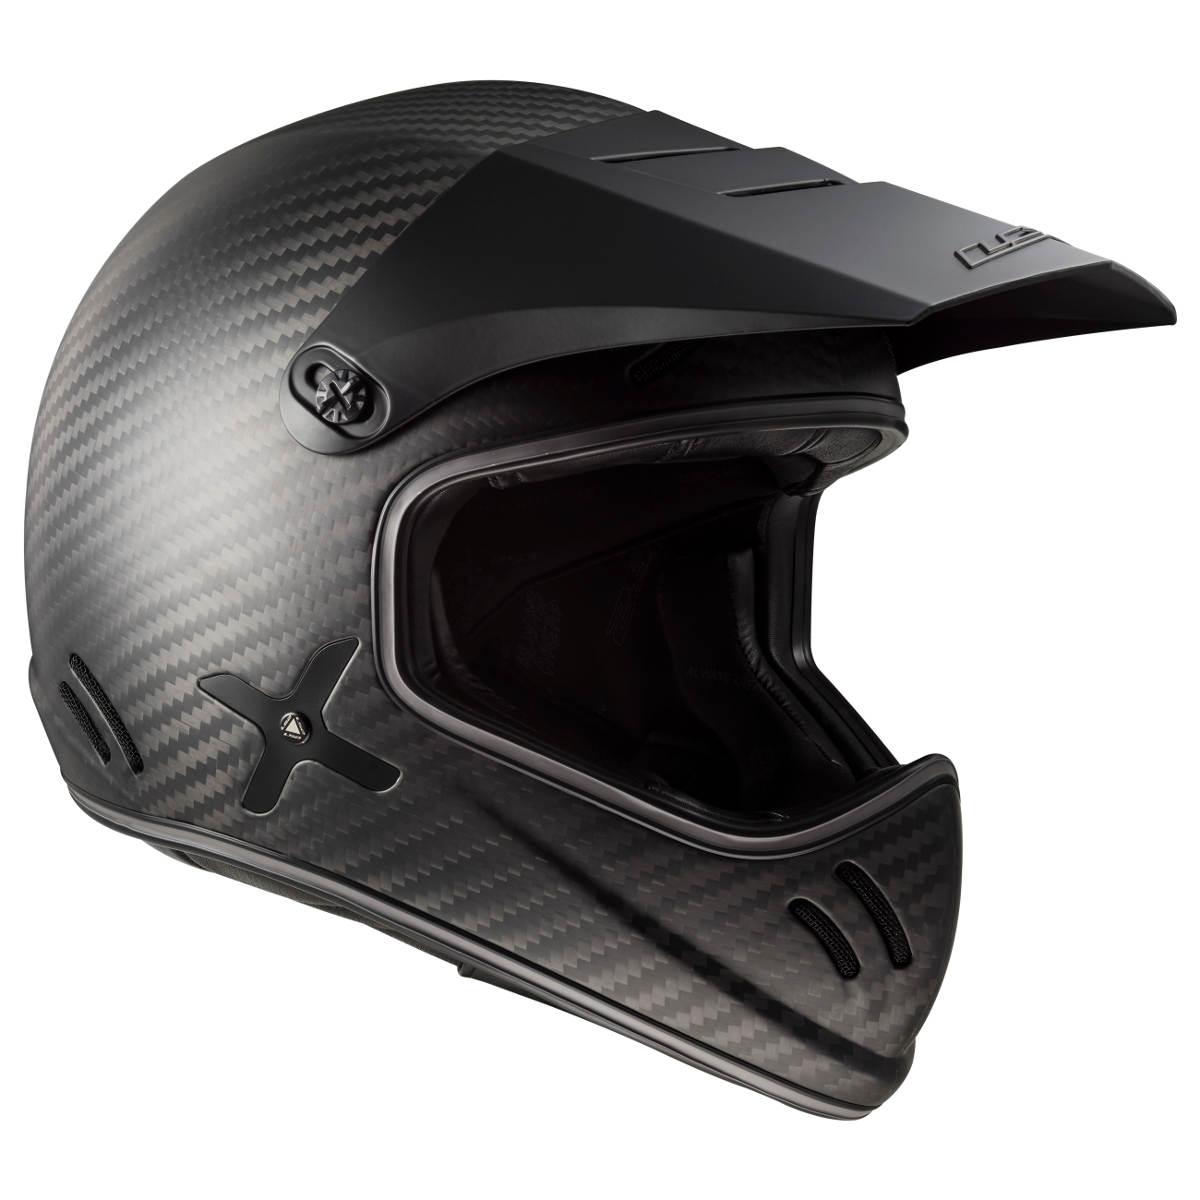 The LS2 Xtra Motorcycle Helmet